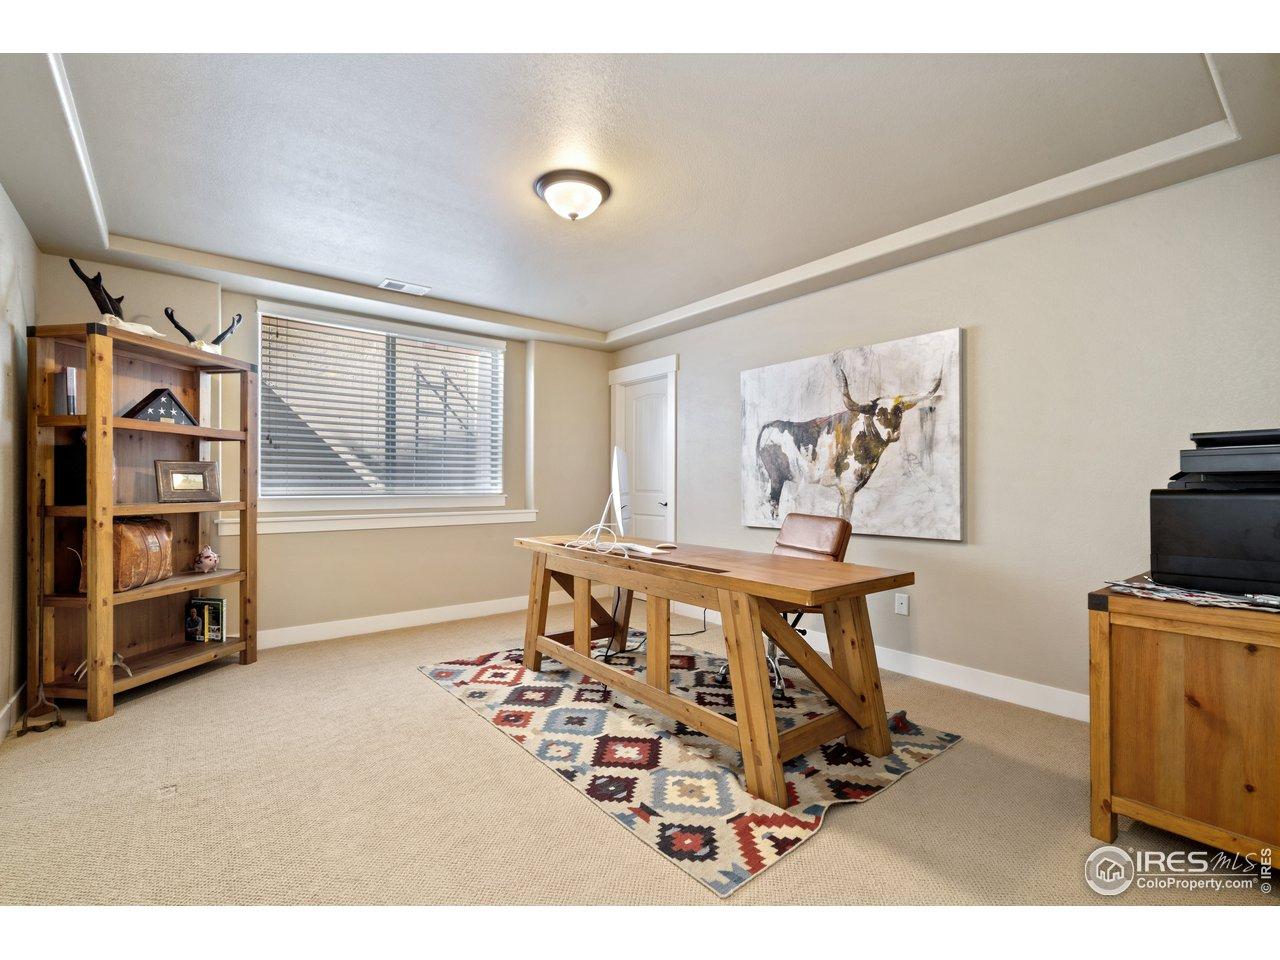 3rd Large Bedroom in Basement